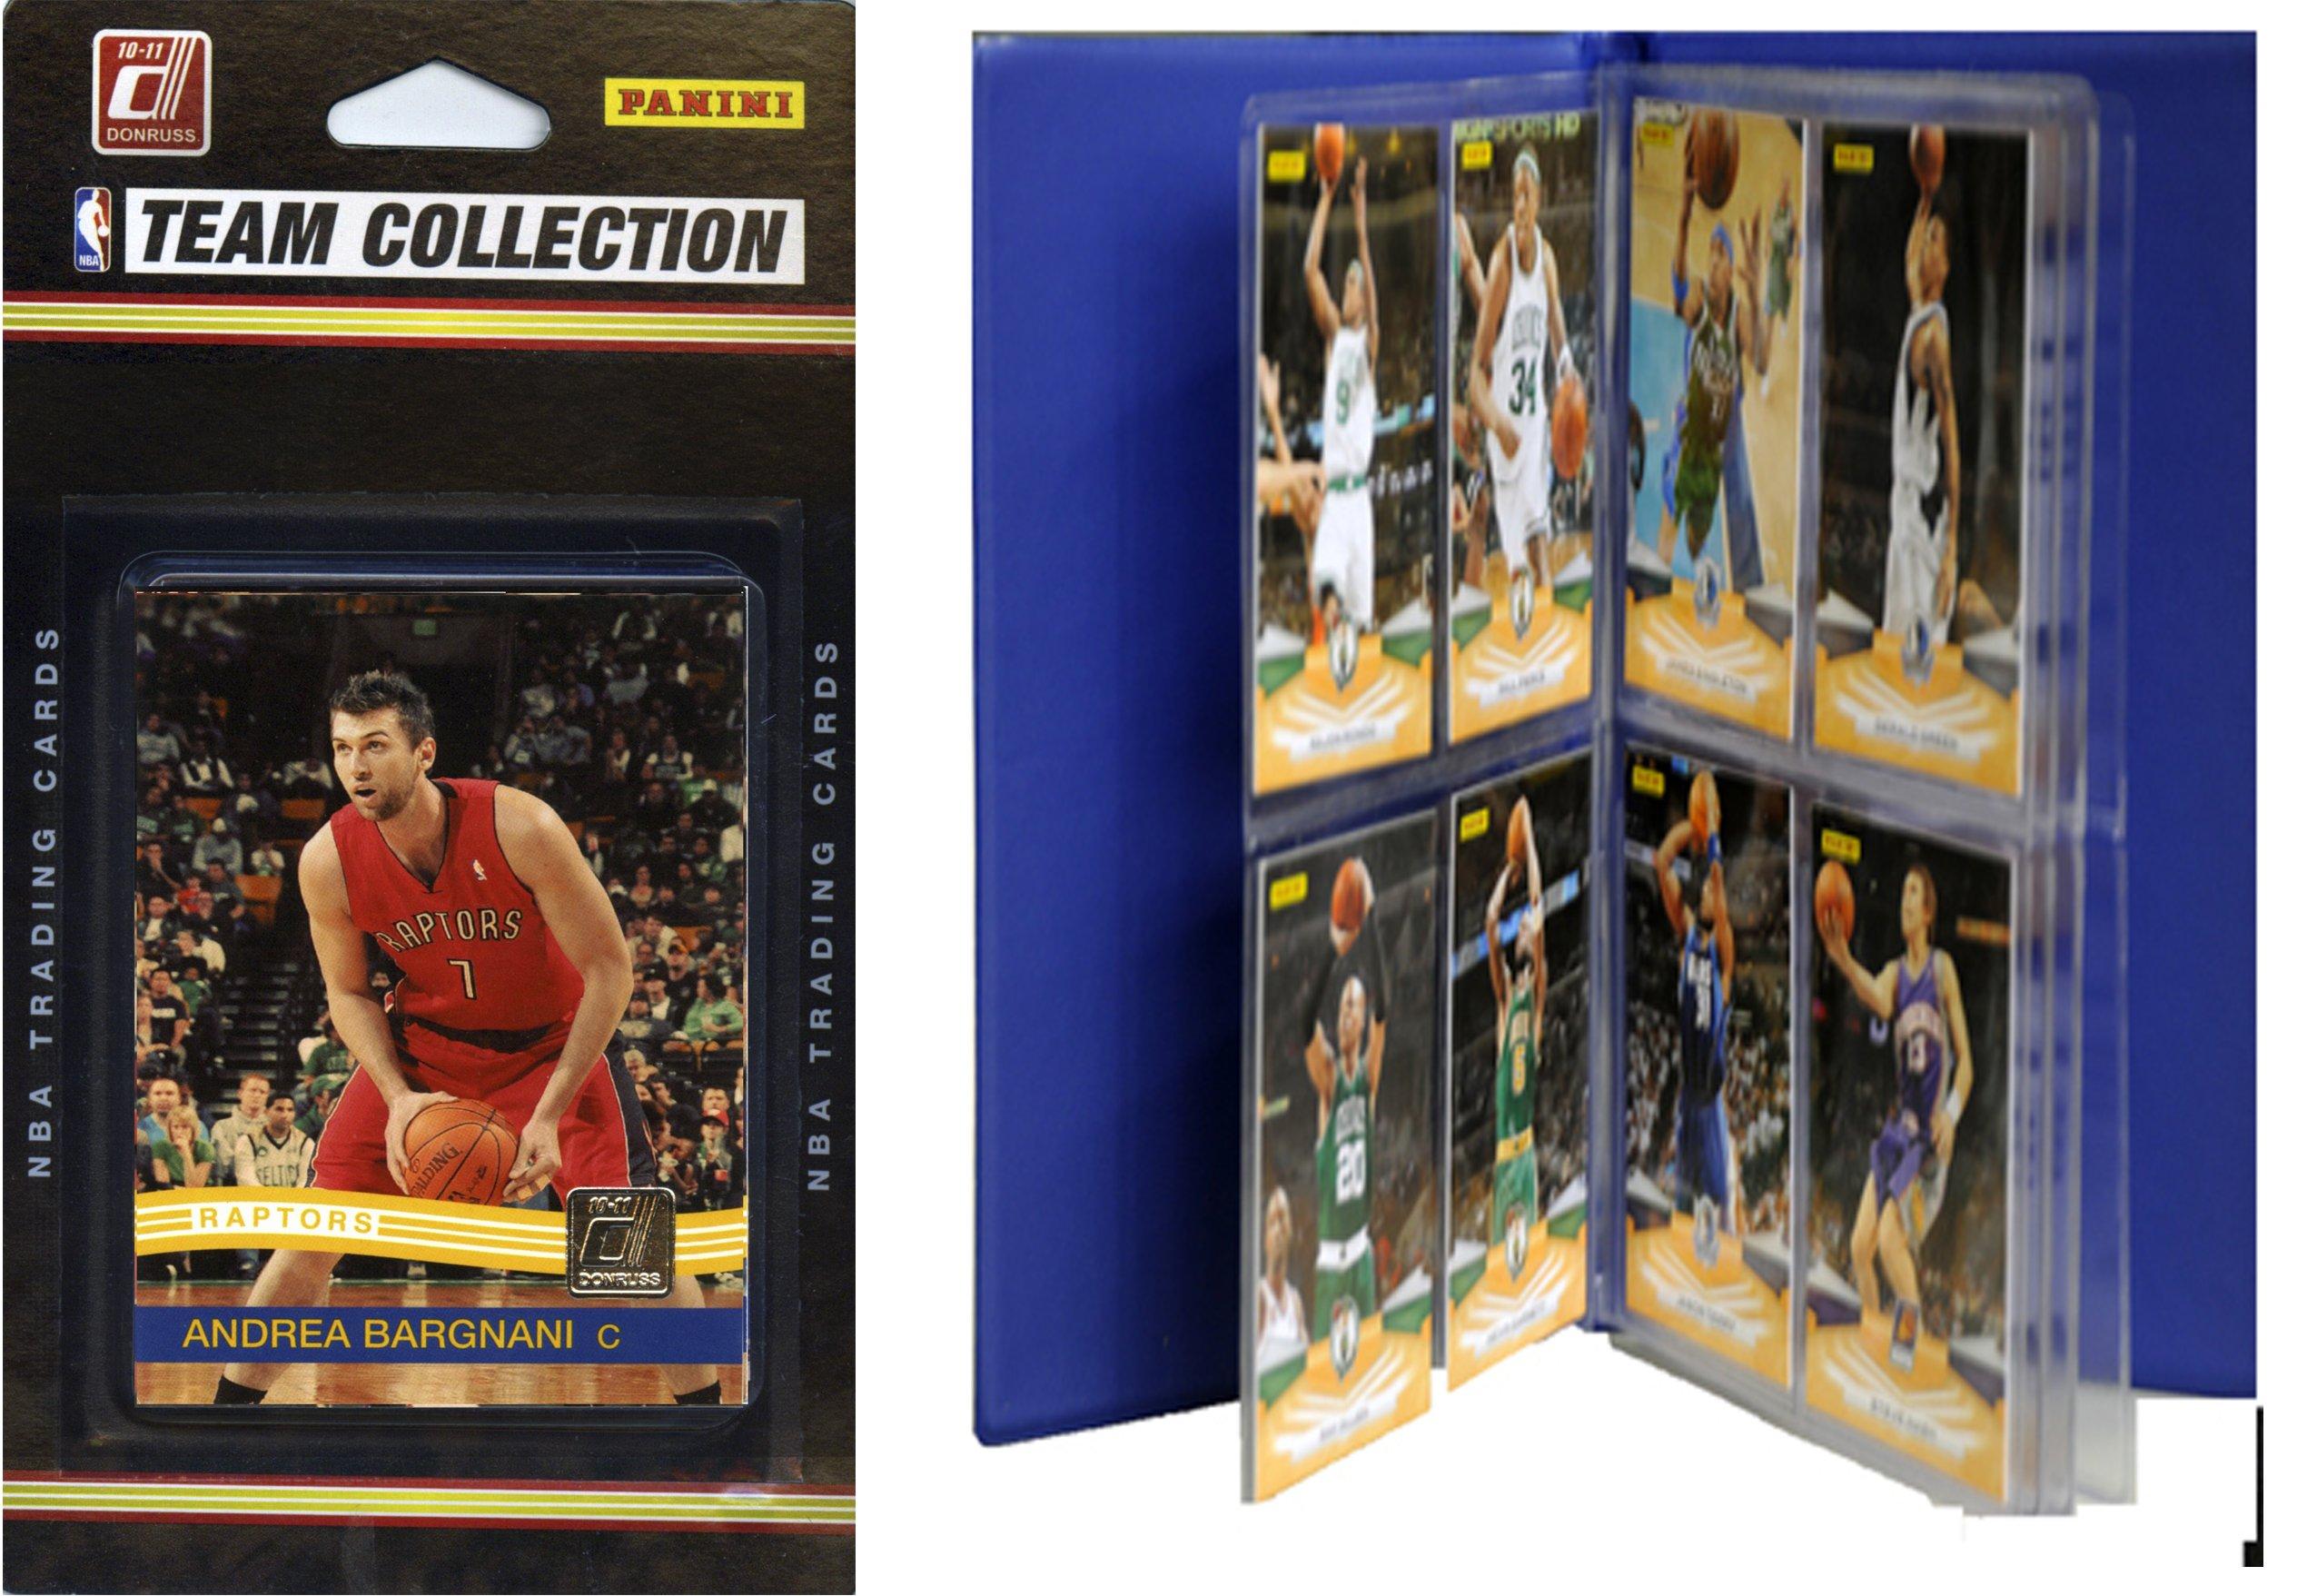 NBA Toronto Raptors Licensed 2010-11 Donruss Team Set Plus Storage Album by C&I Collectables